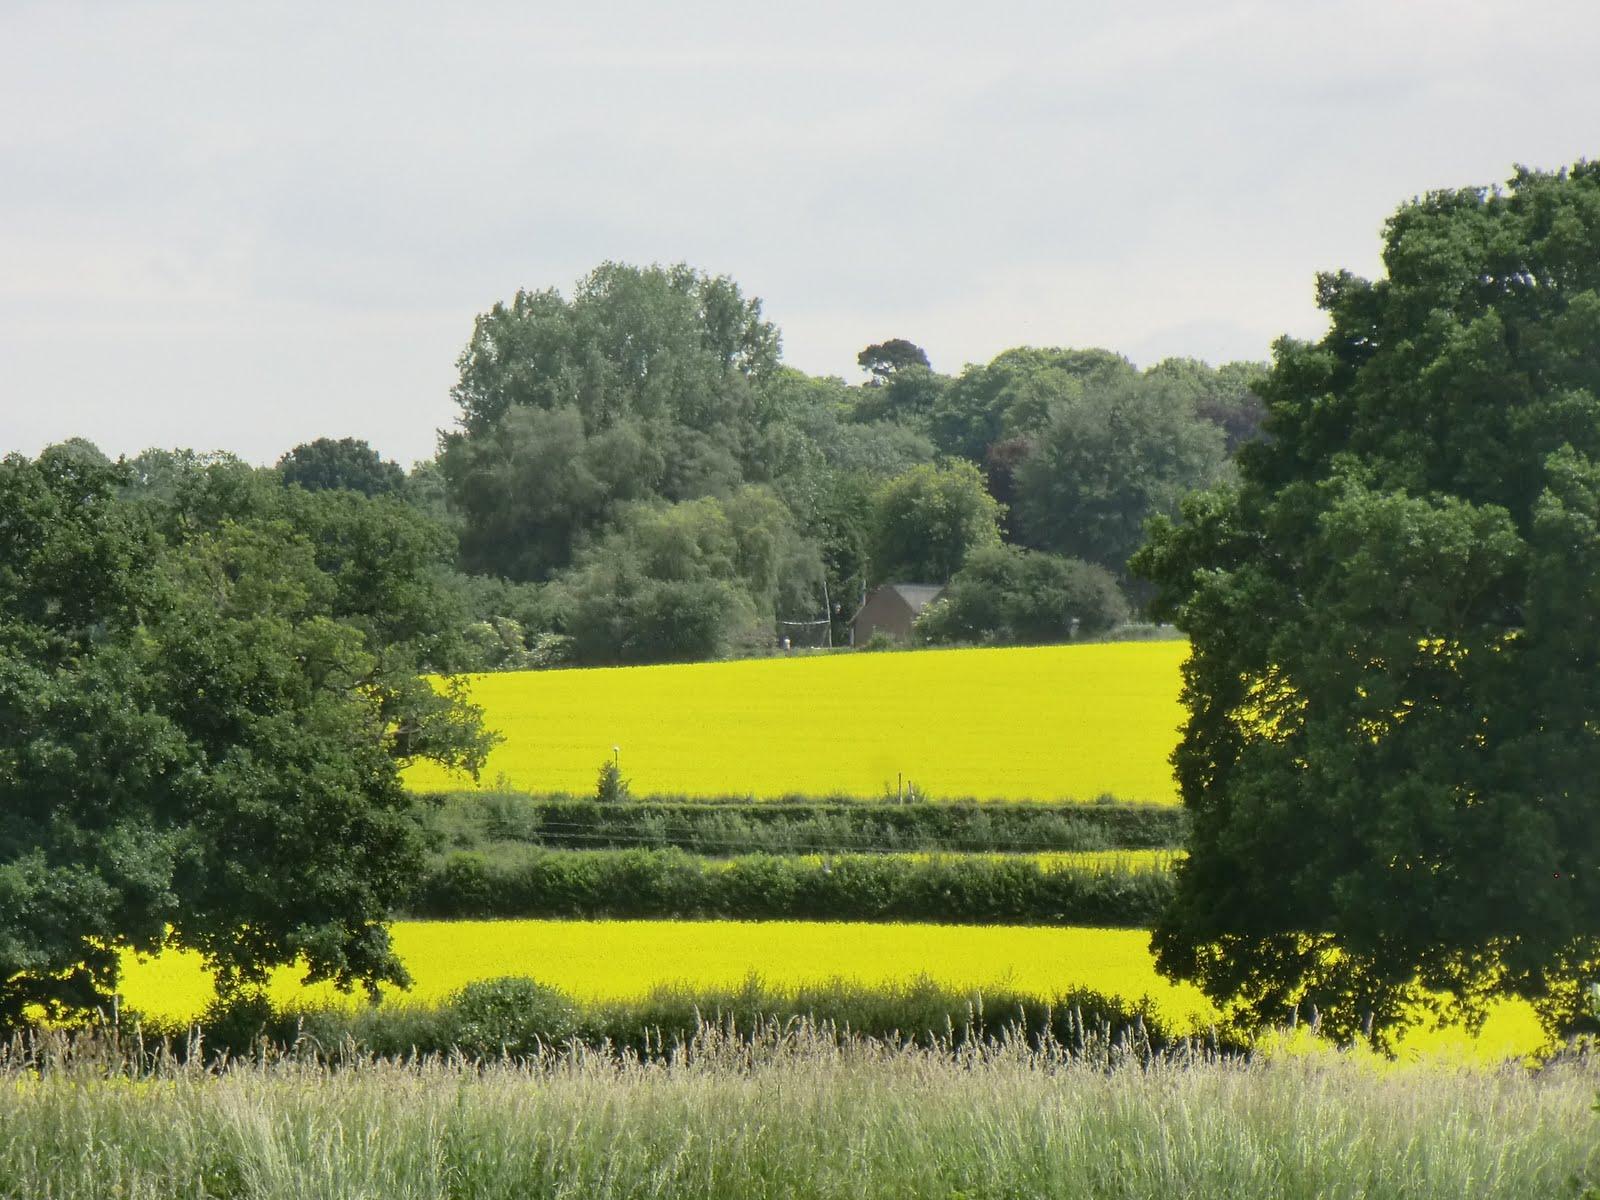 CIMG7321 Rape fields, Medway valley